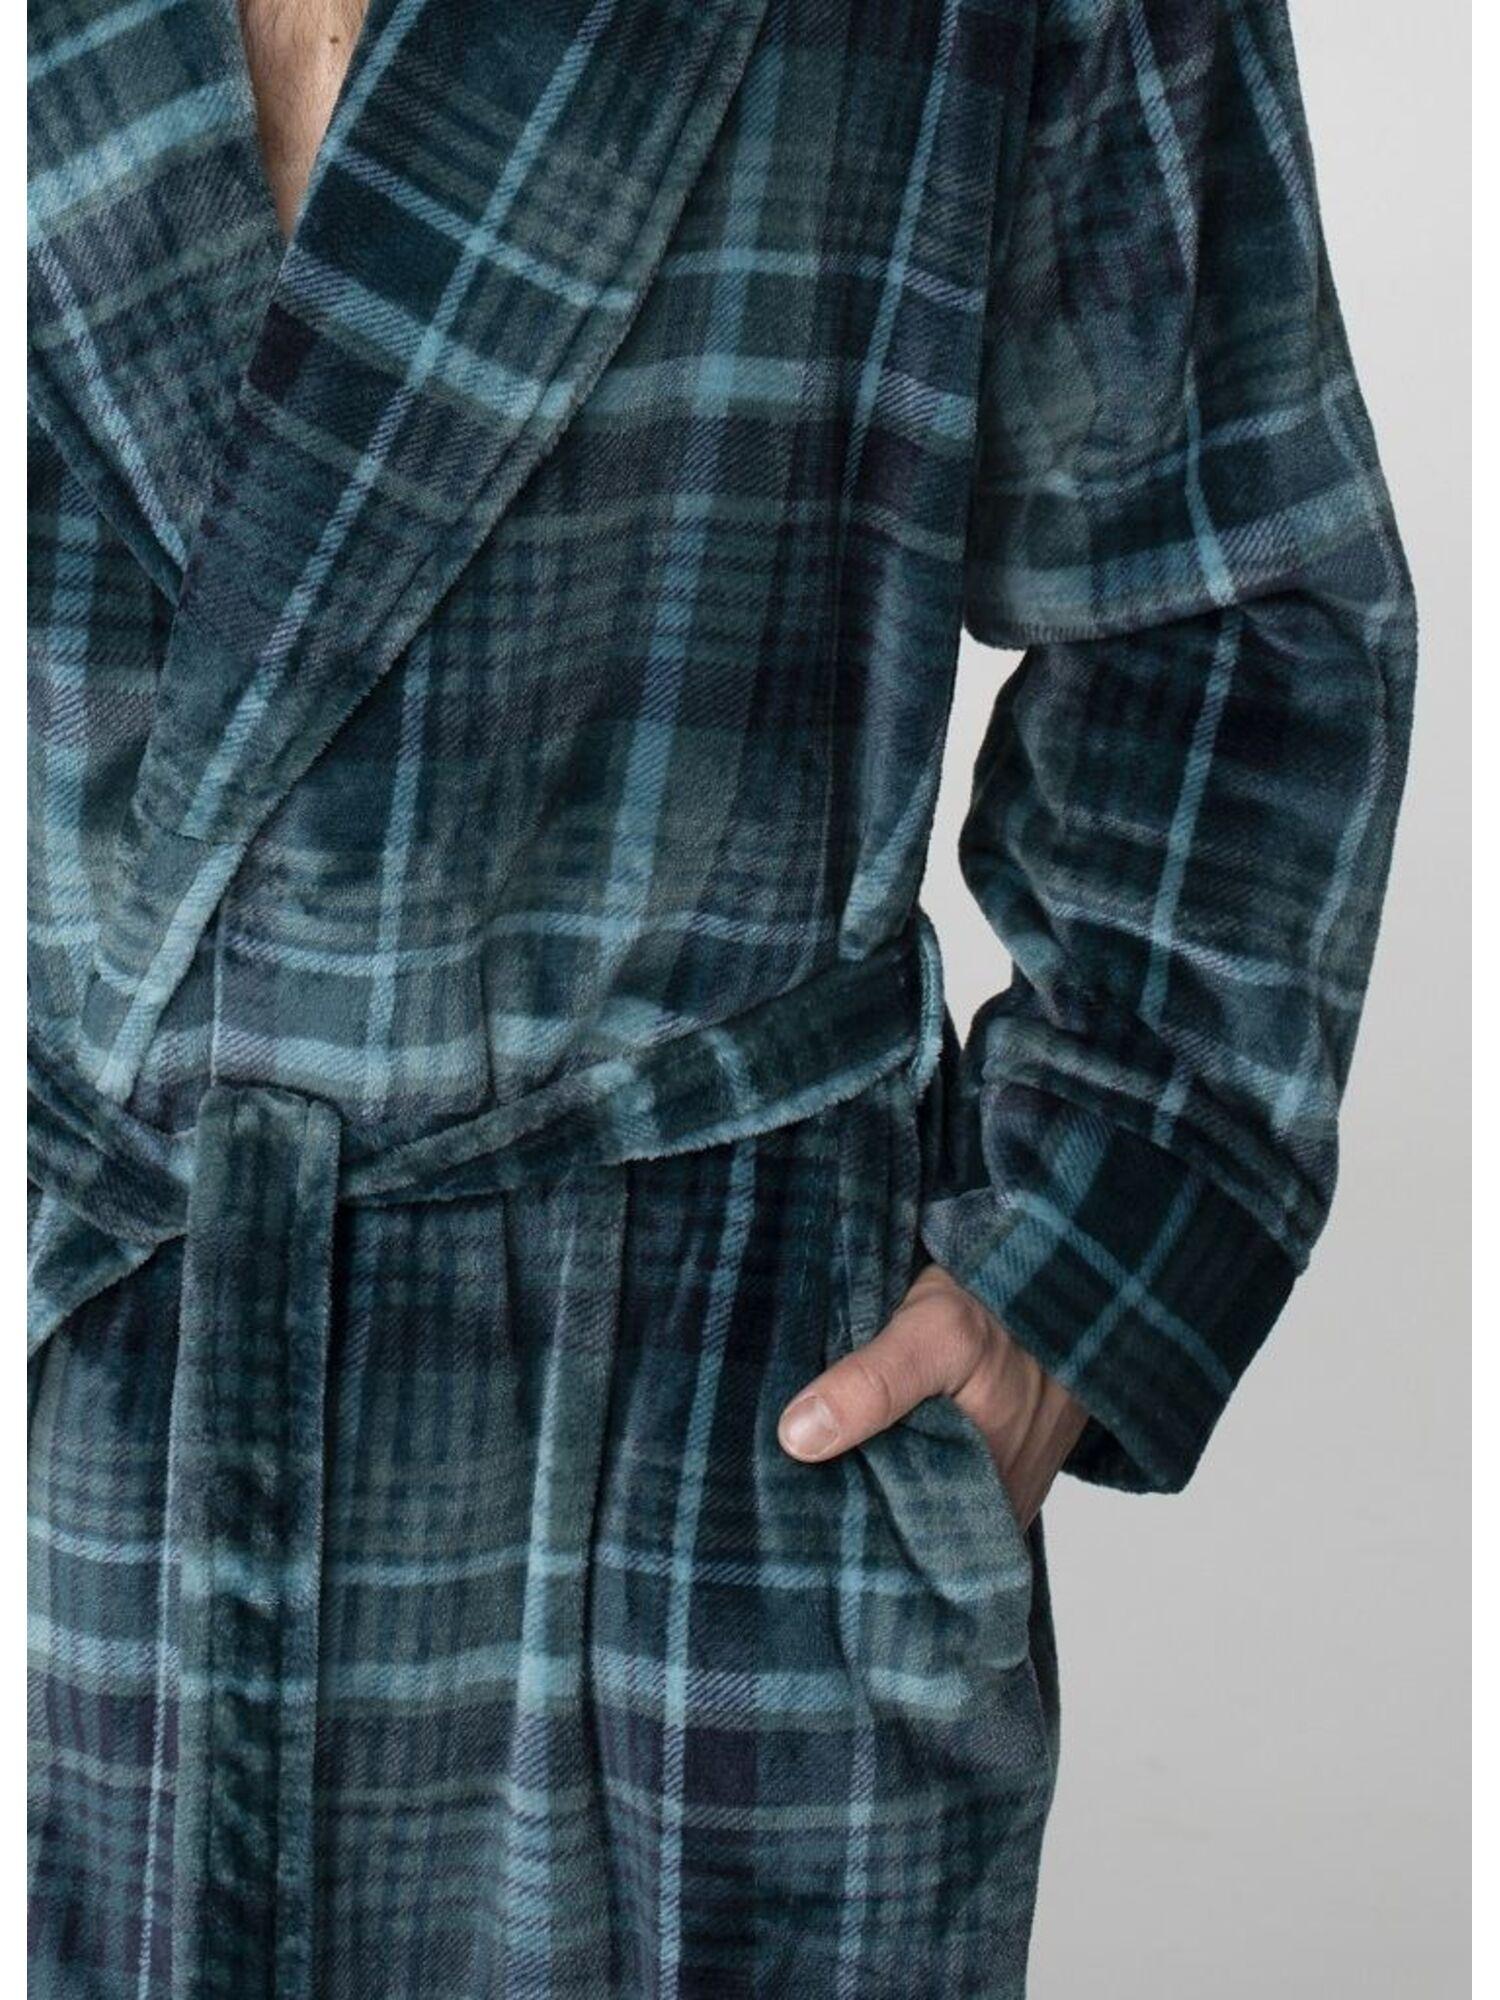 Мужской теплый халат MGL 048 19/20 зеленый, KEY